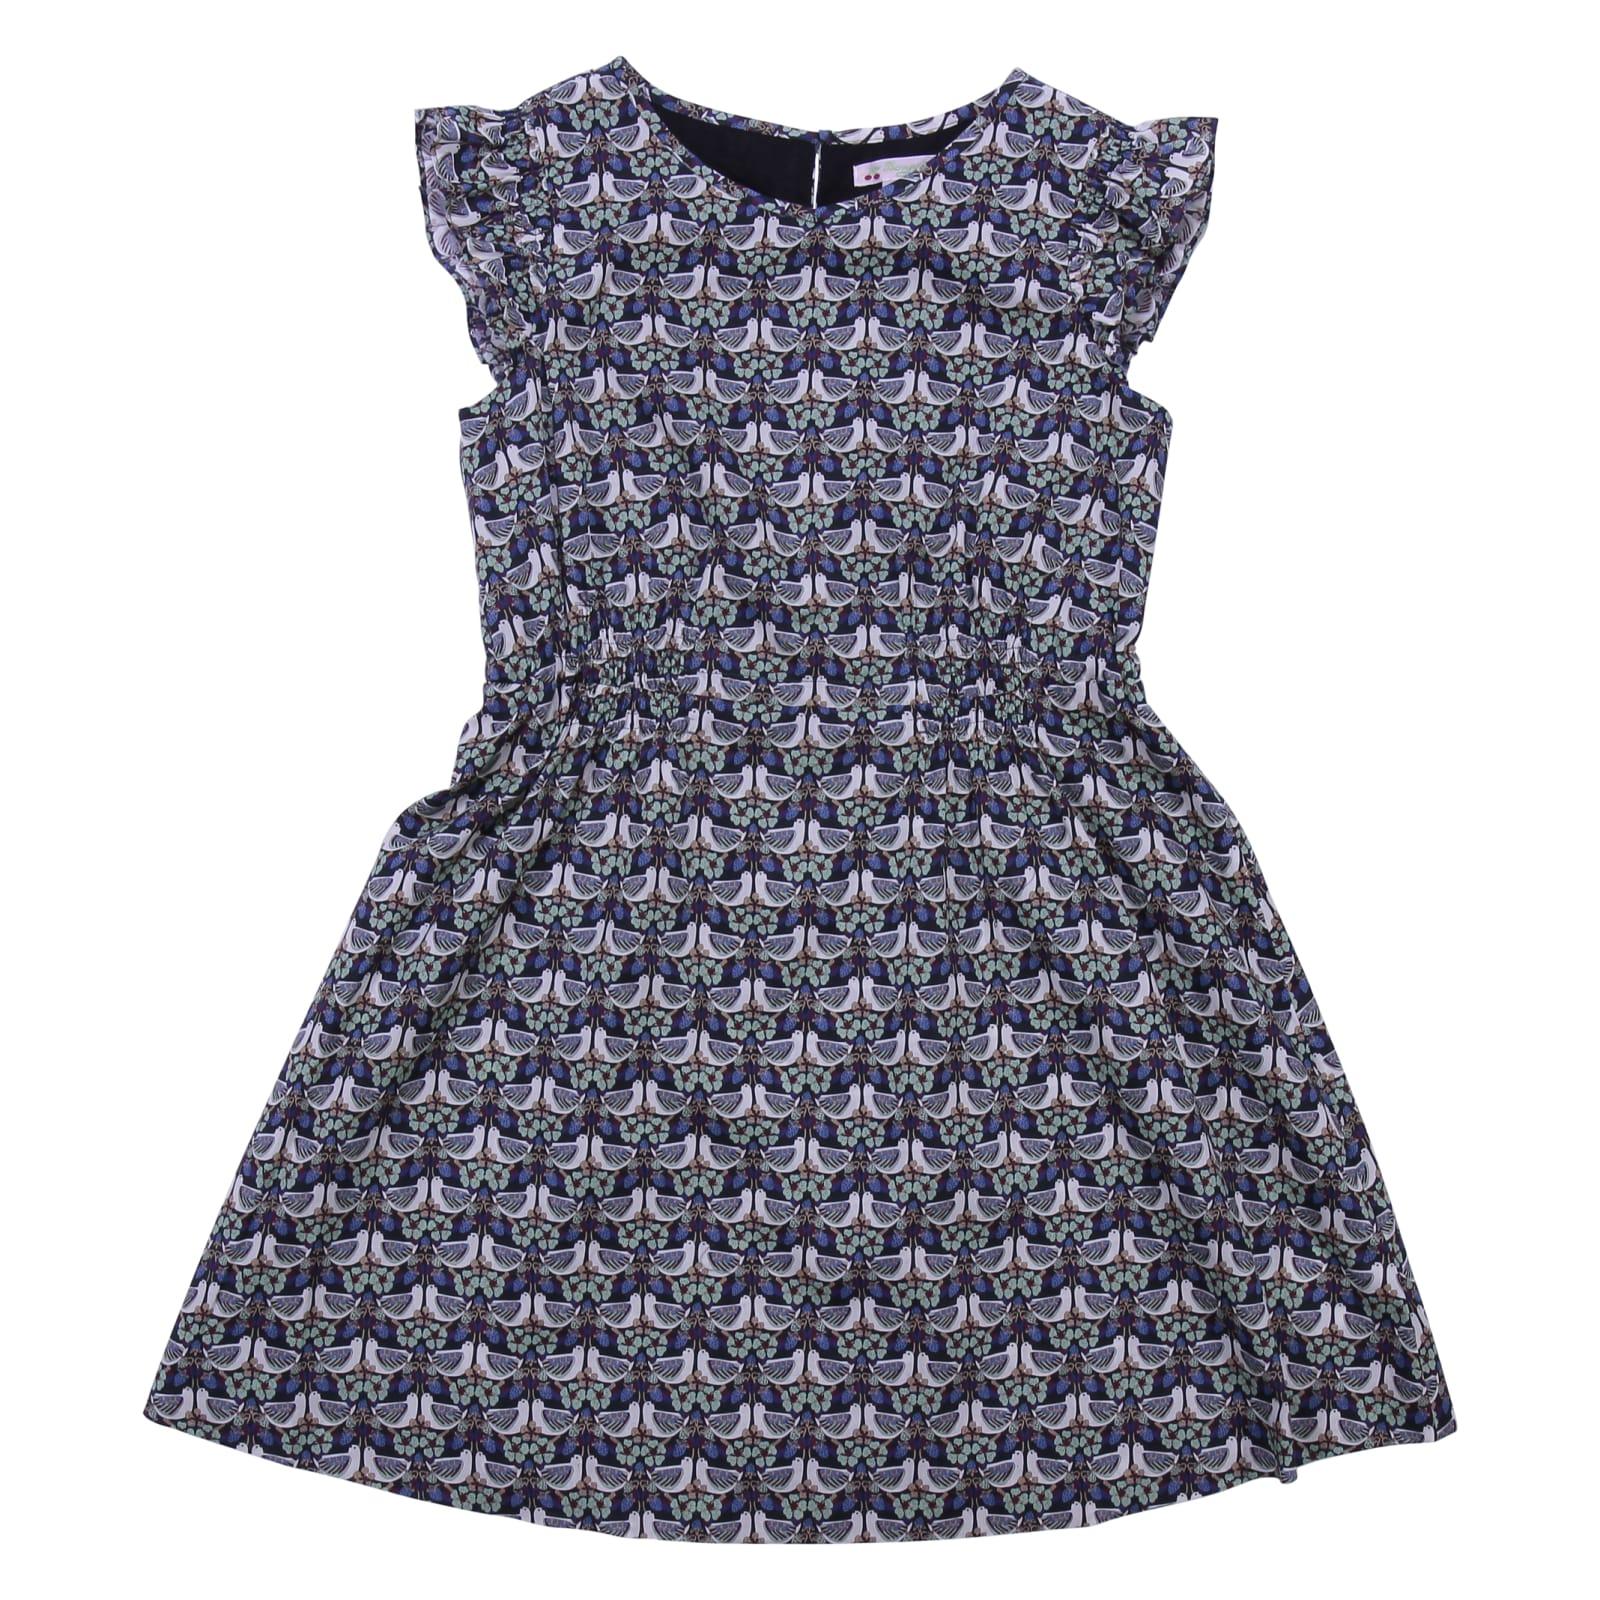 Bonpoint Printed Cotton Dress